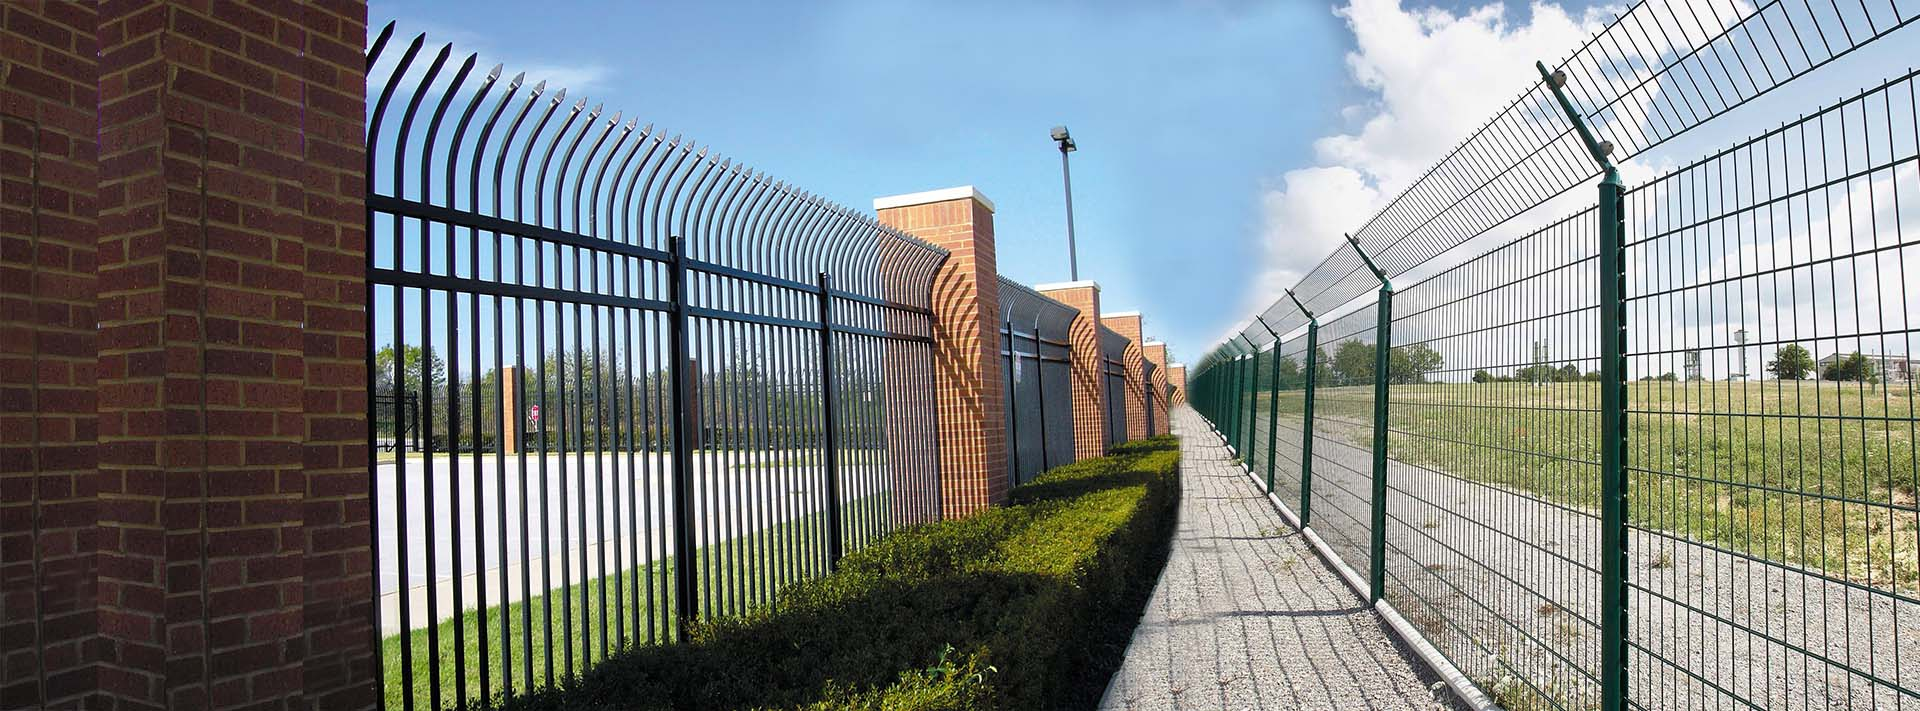 Fences panel